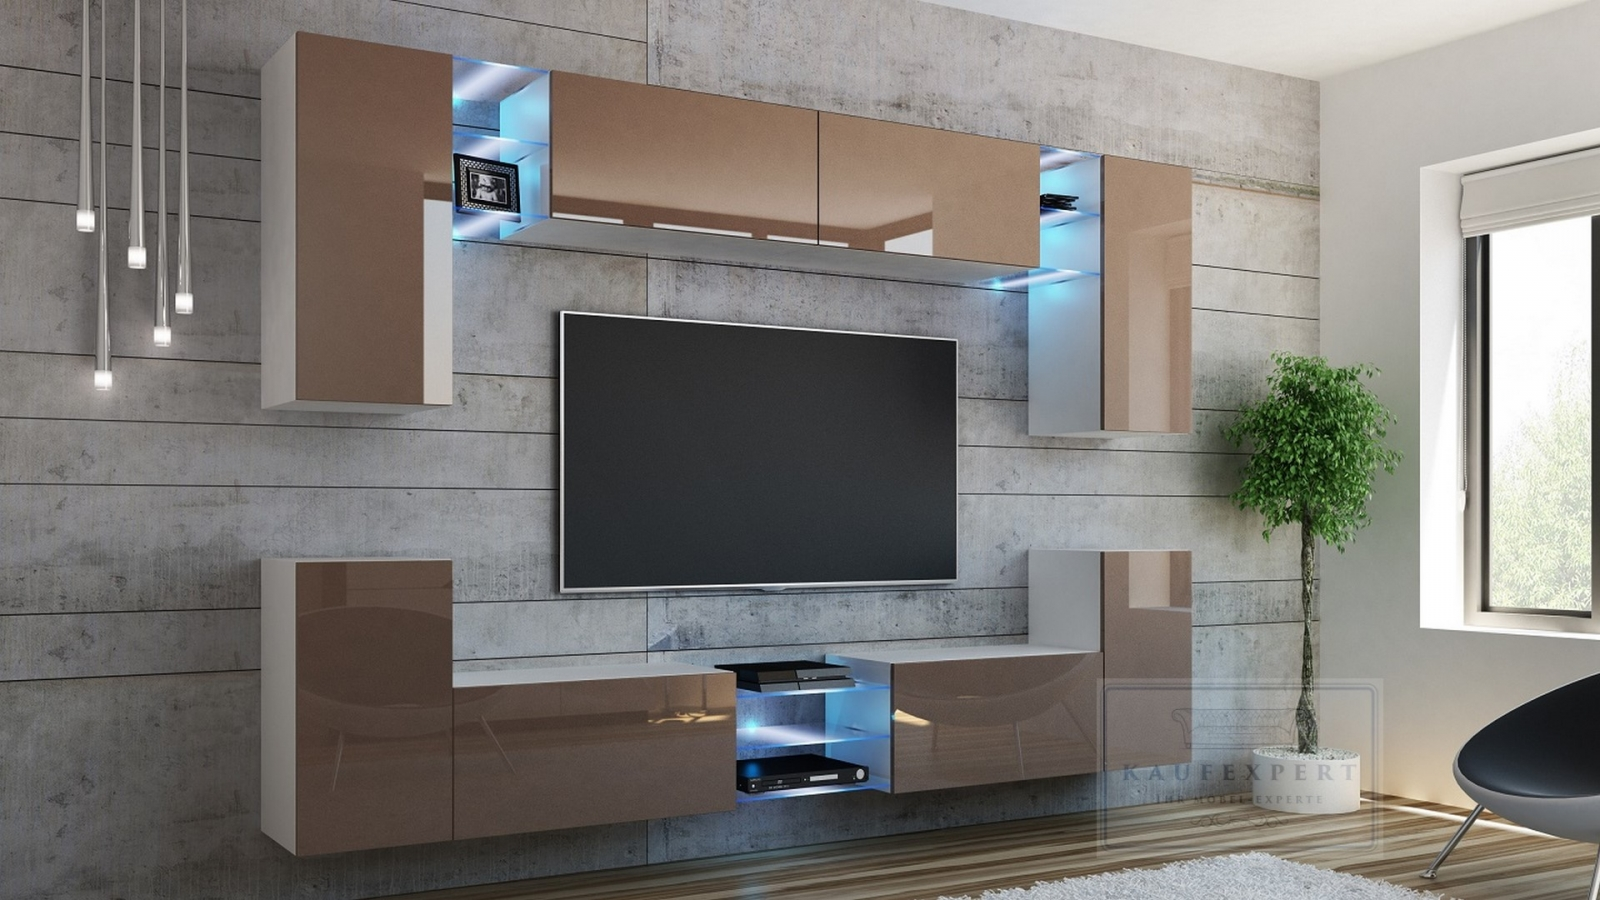 Fantastisch Wohnwand Galaxy Cappuccino Hochglanz/ Weiß Mediawand Medienwand Design  Modern Led Beleuchtung MDF Hochglanz Hängewand Hängeschrank